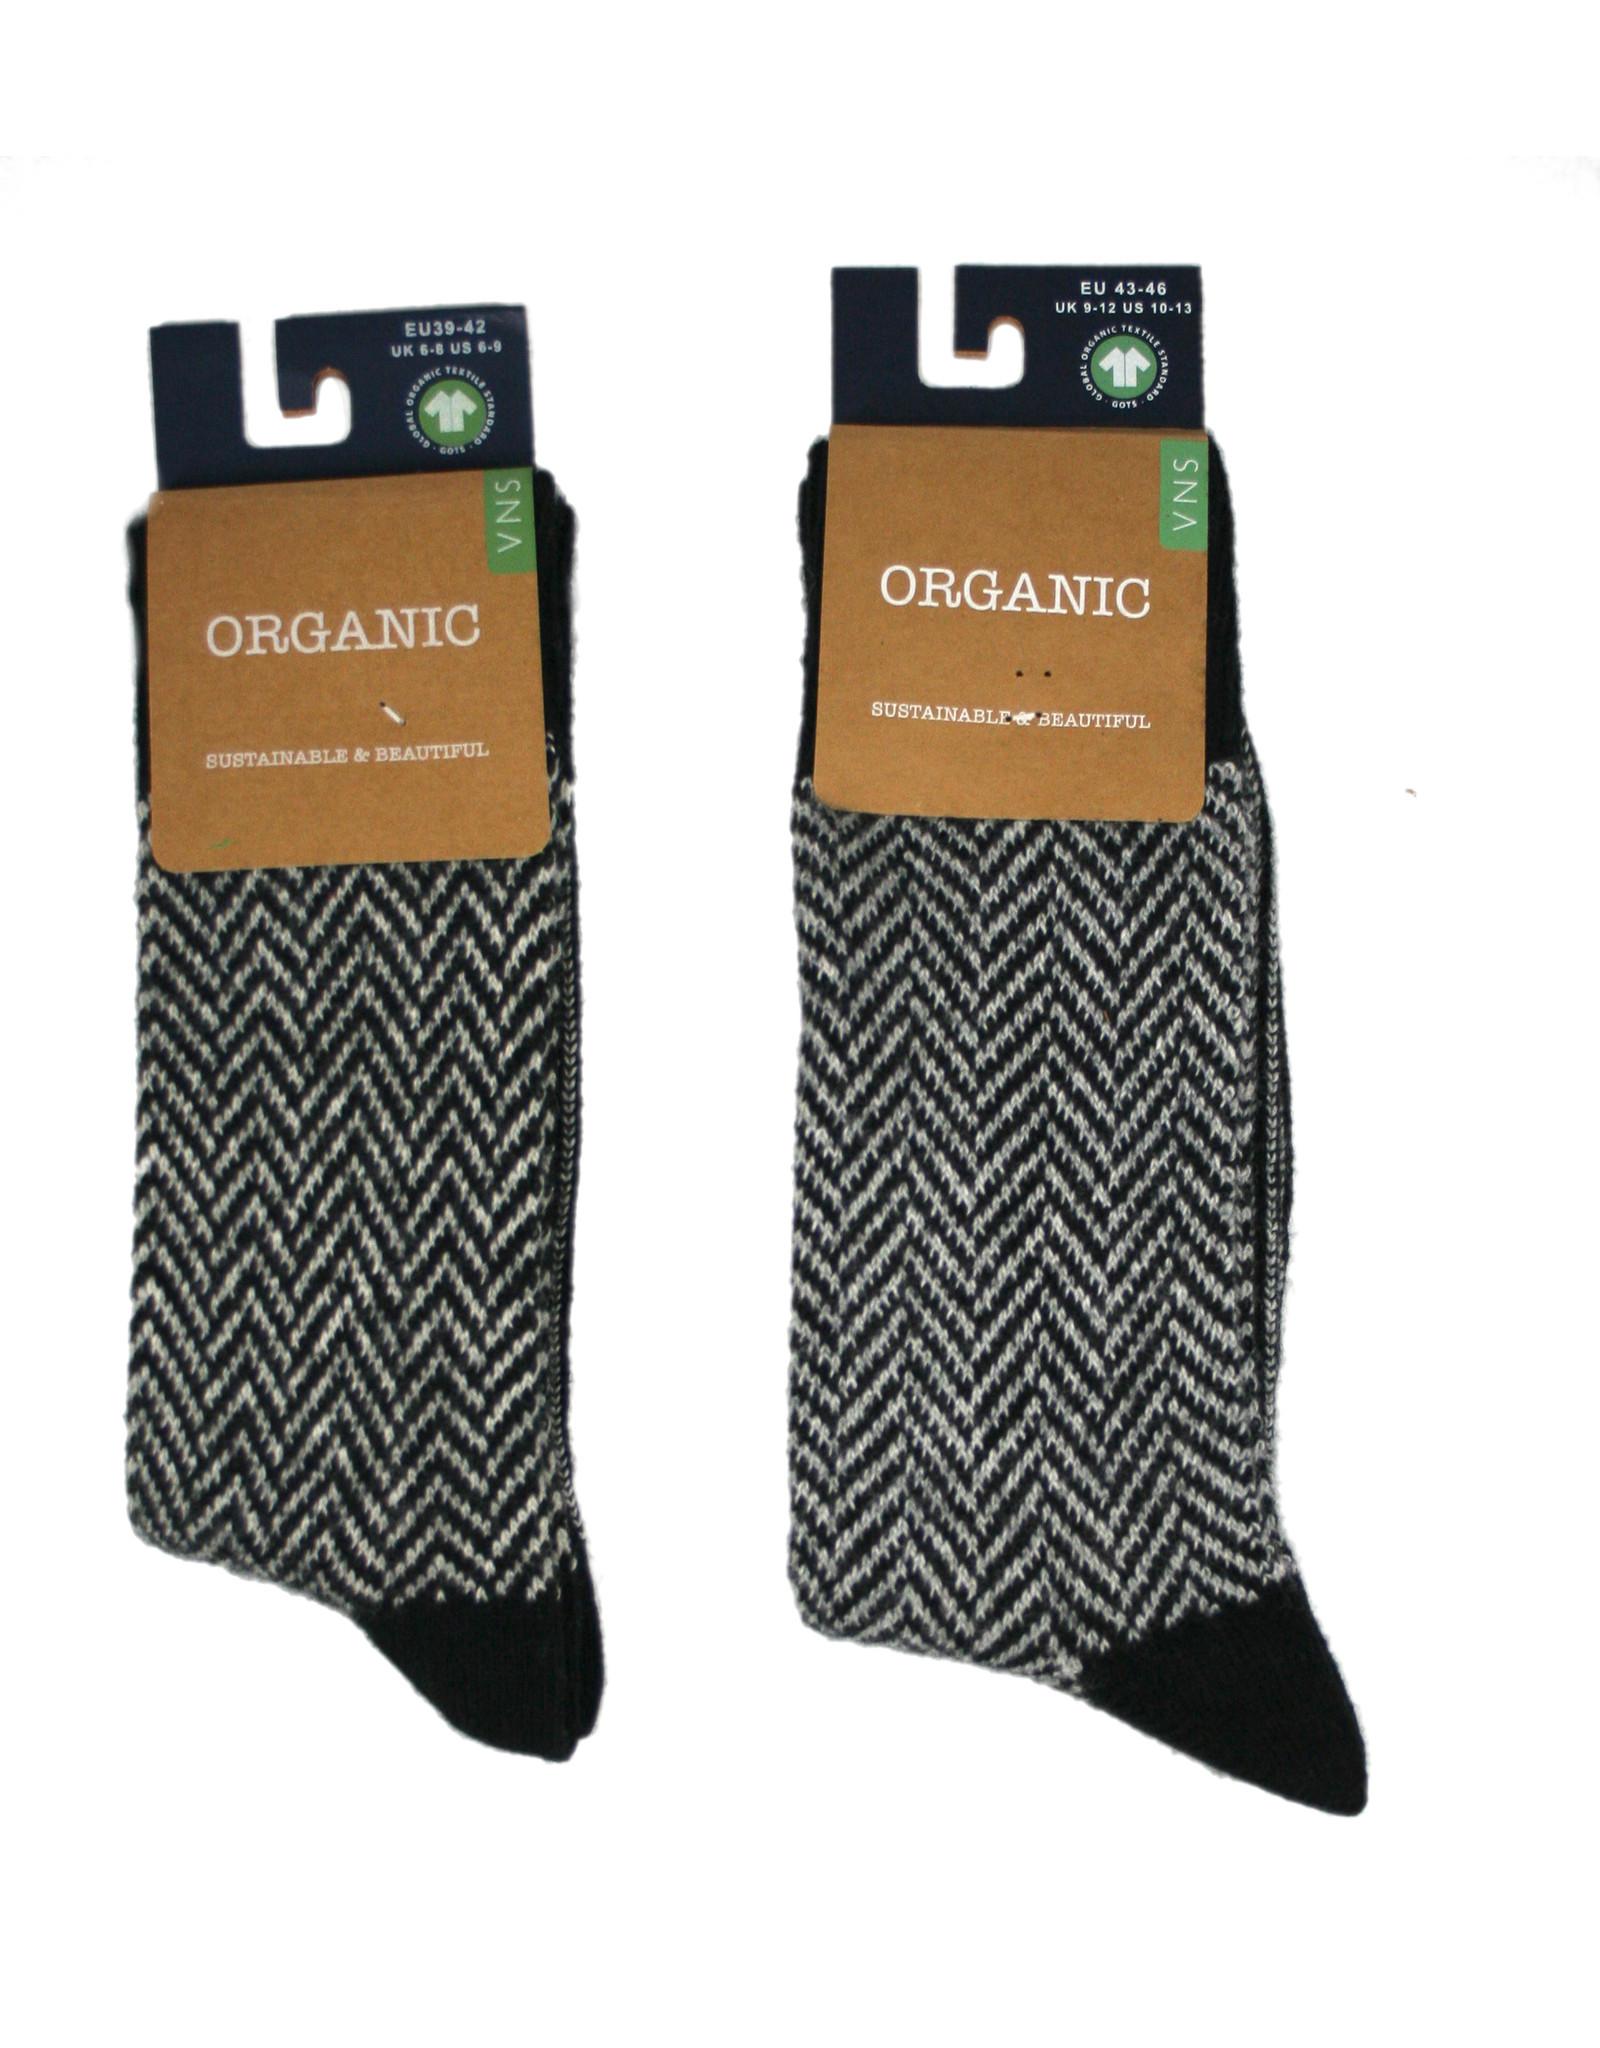 bls organic socks  Socken Baumwolle, Wolle